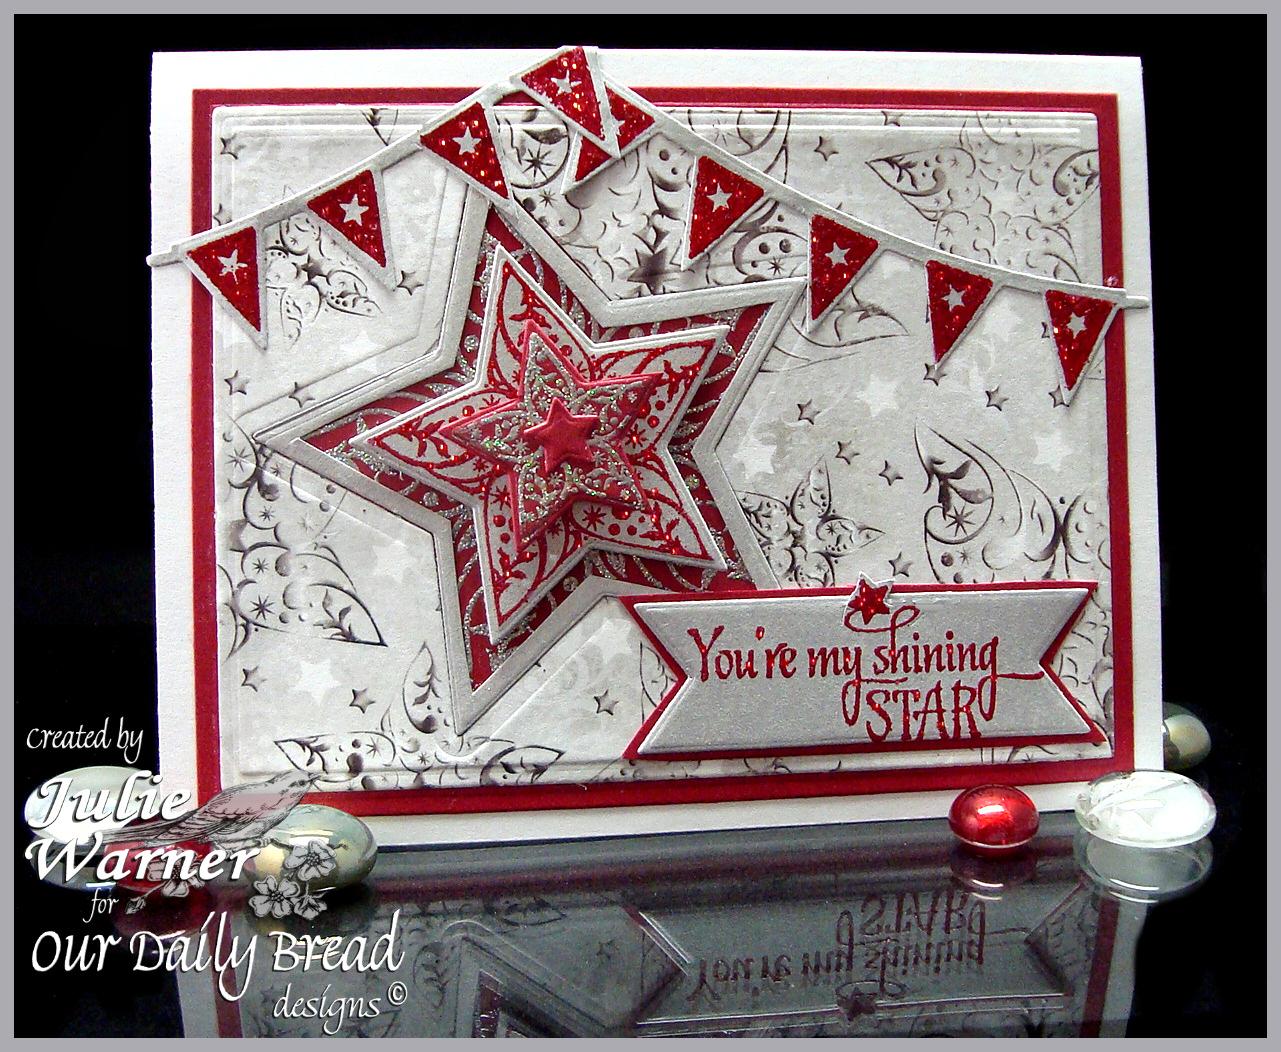 Stamps - Our Daily Bread Designs Shine On, Patriotic Pennants, ODBD Custom Sparkling Stars Dies, ODBD Winter Paper Collection 2014, ODBD Custom Pennant Row Die, ODBD Custom Pennant Dies